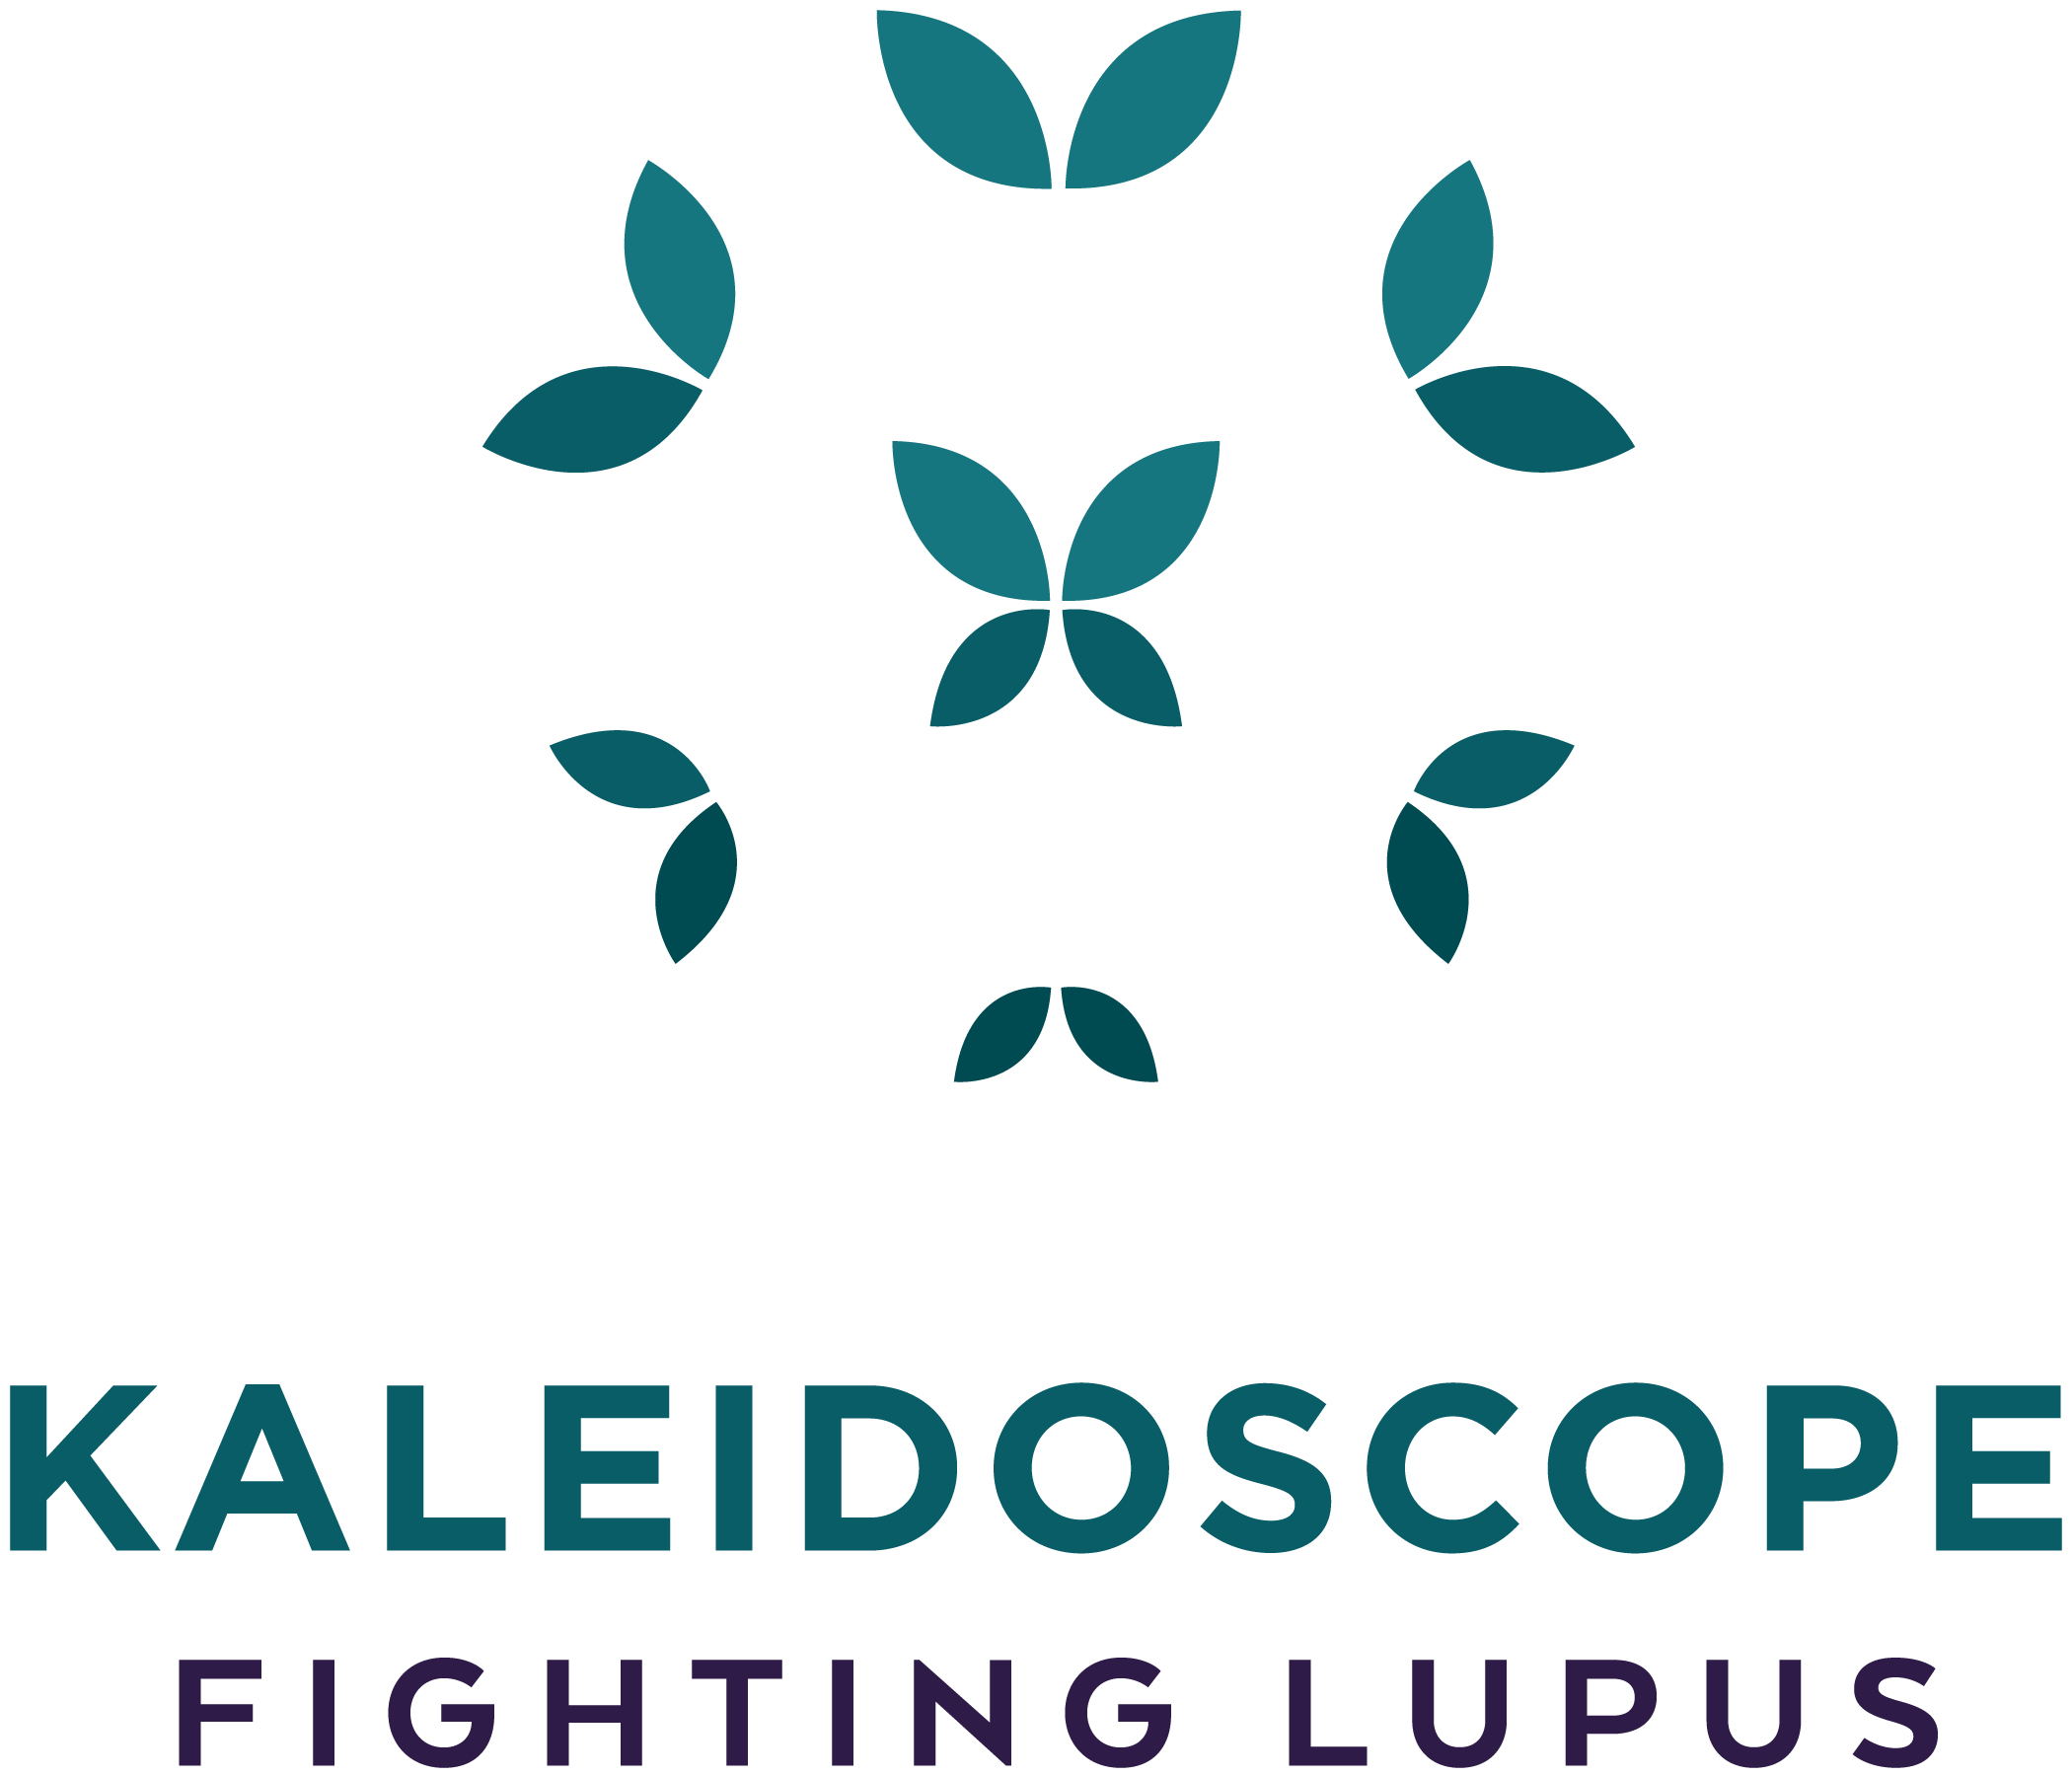 Kaleidoscope Fighting Lupus logo